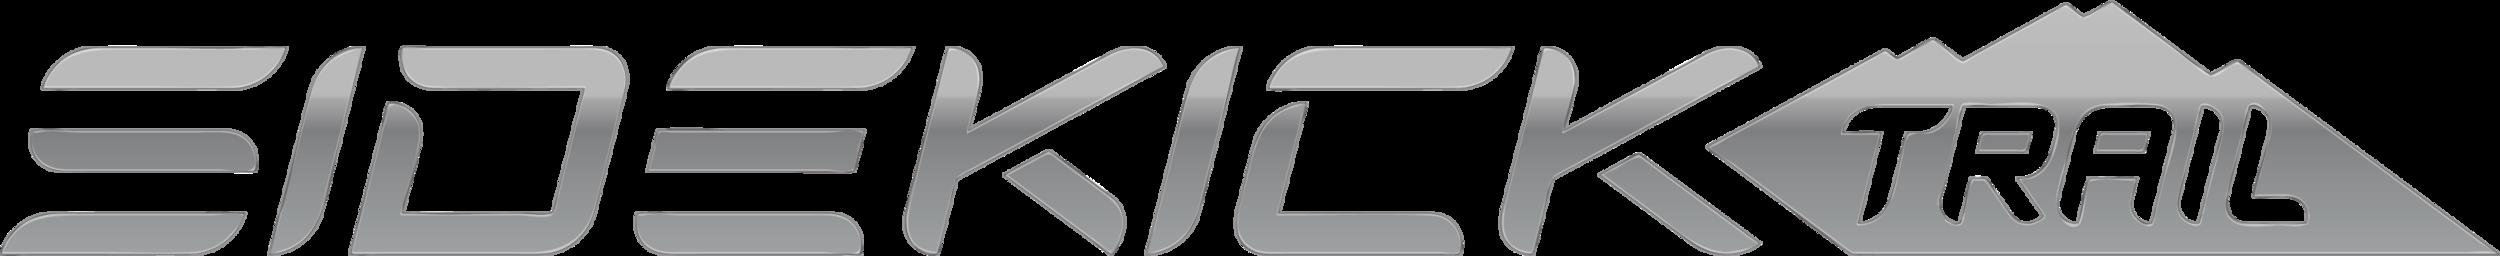 sidekick trail logo metal.png